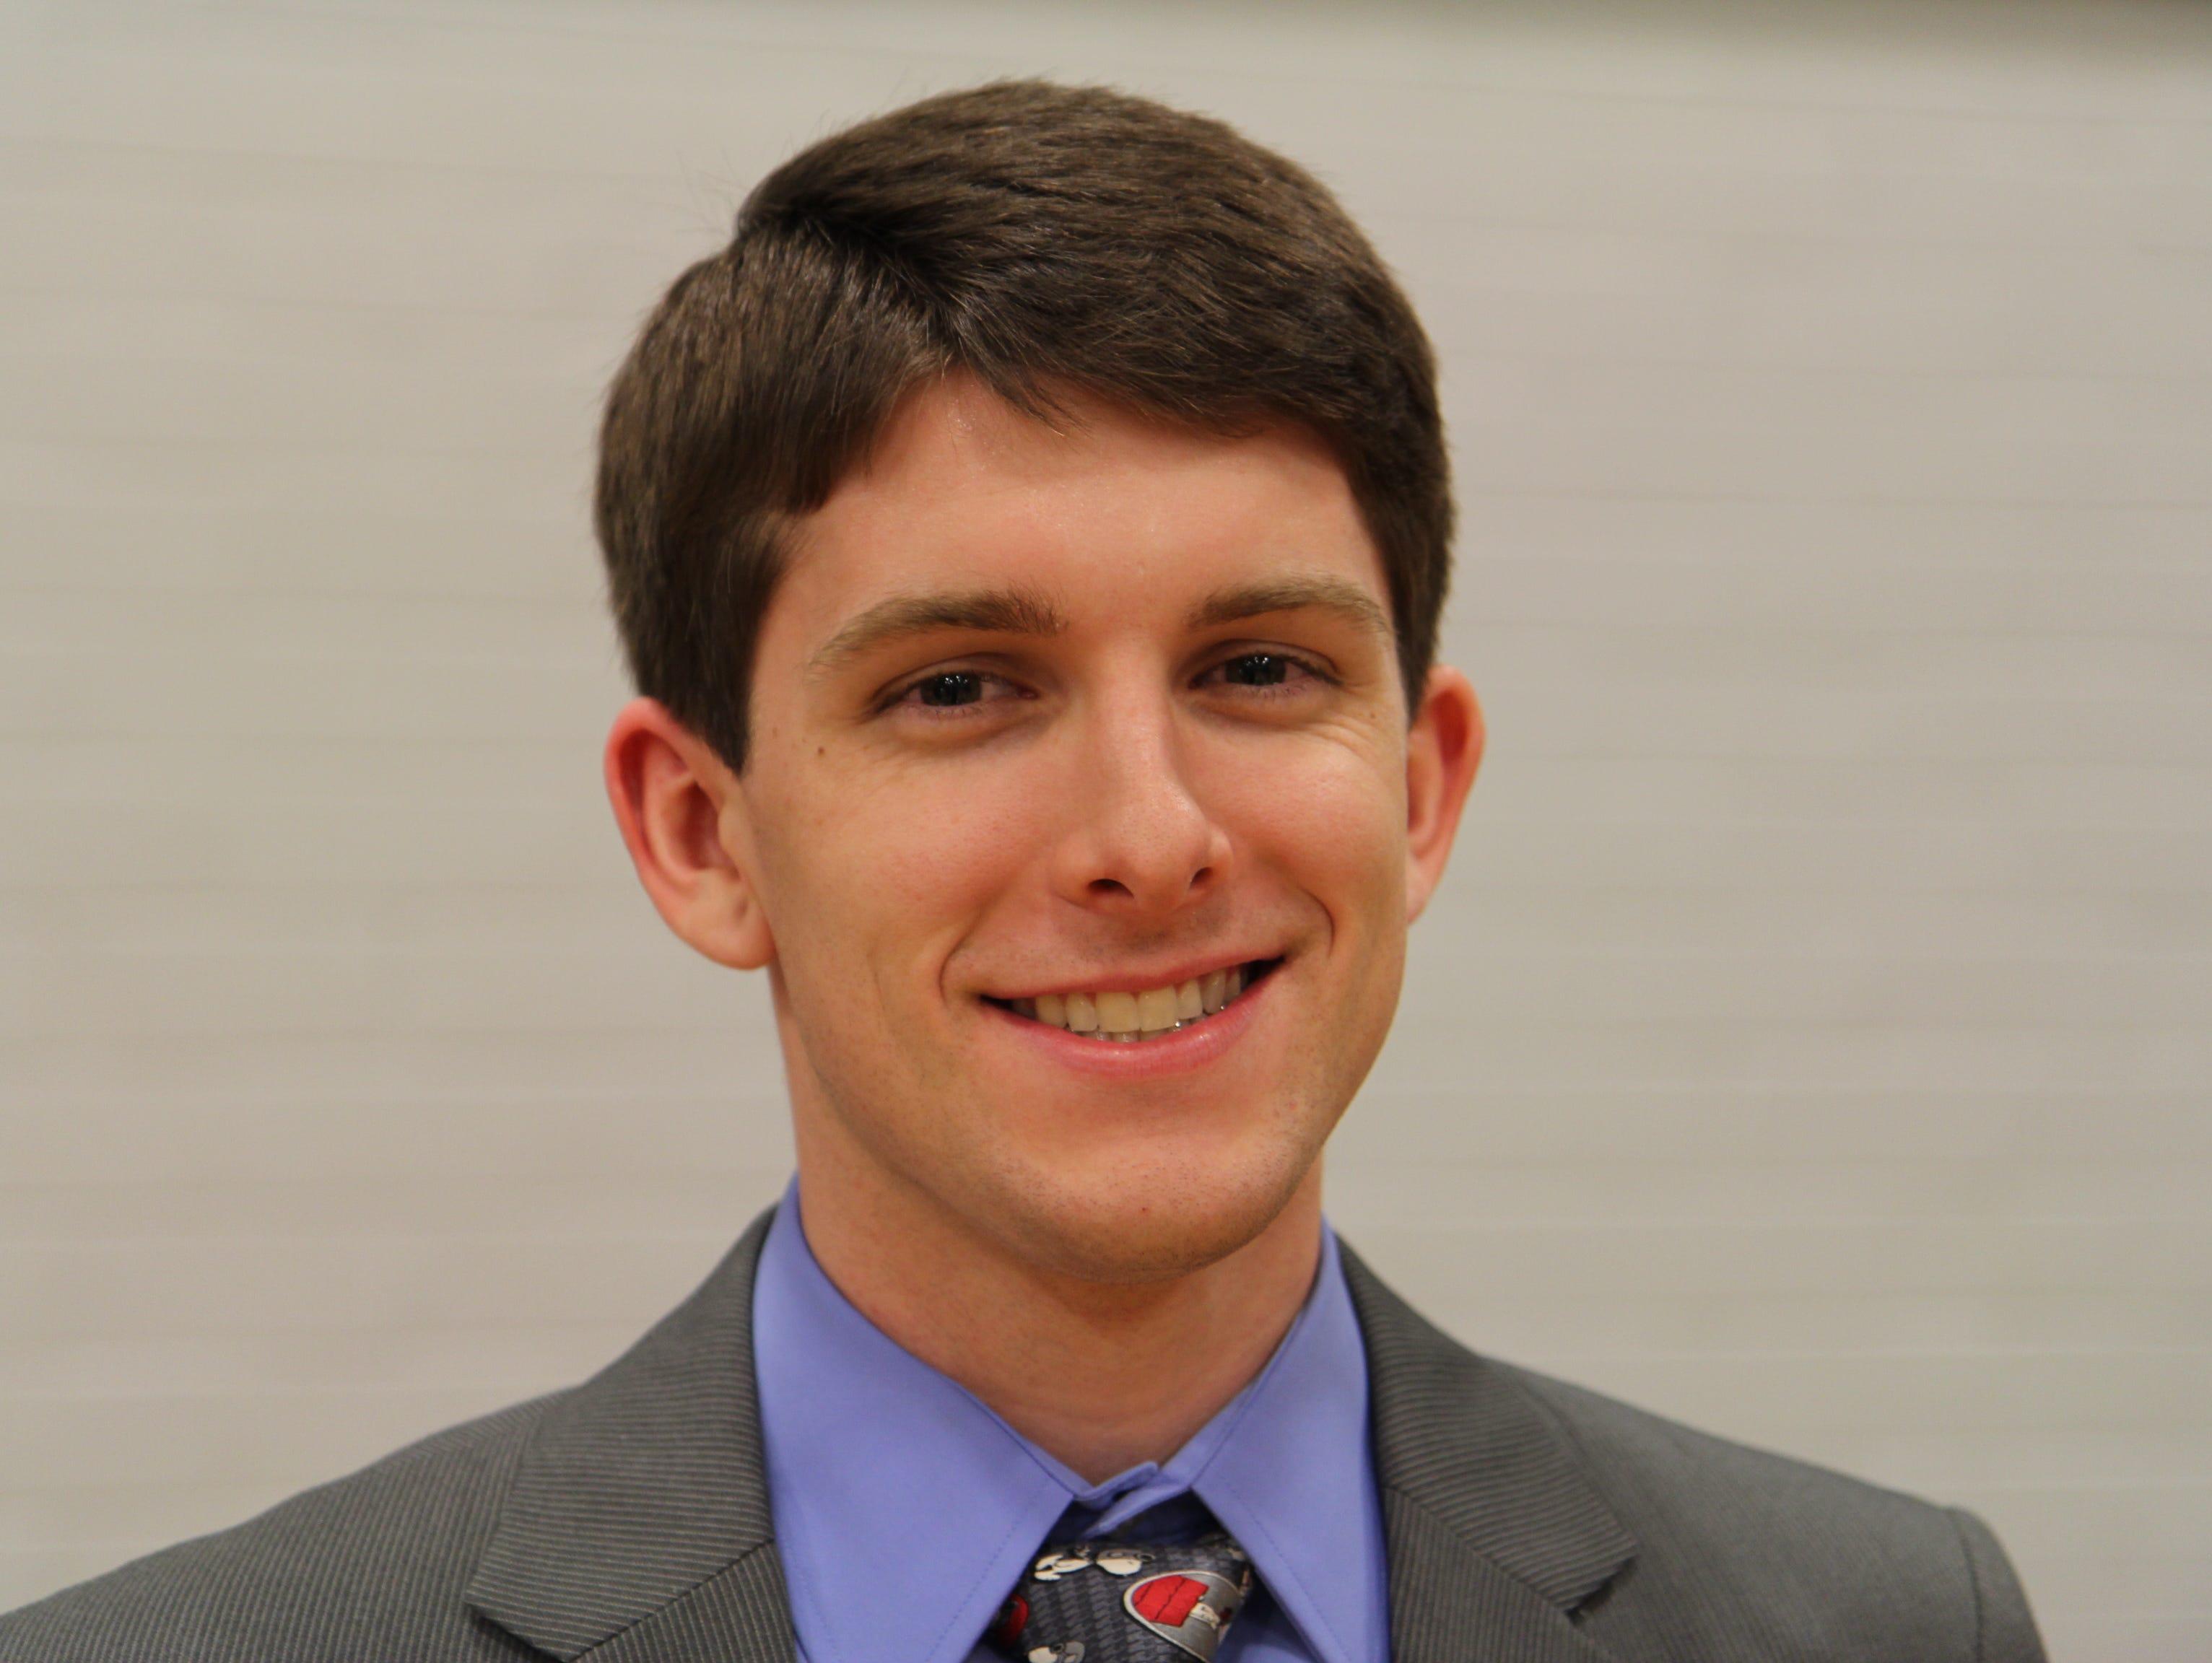 Ben Schonfarber is the new Loyola College Prep boys basketball coach.